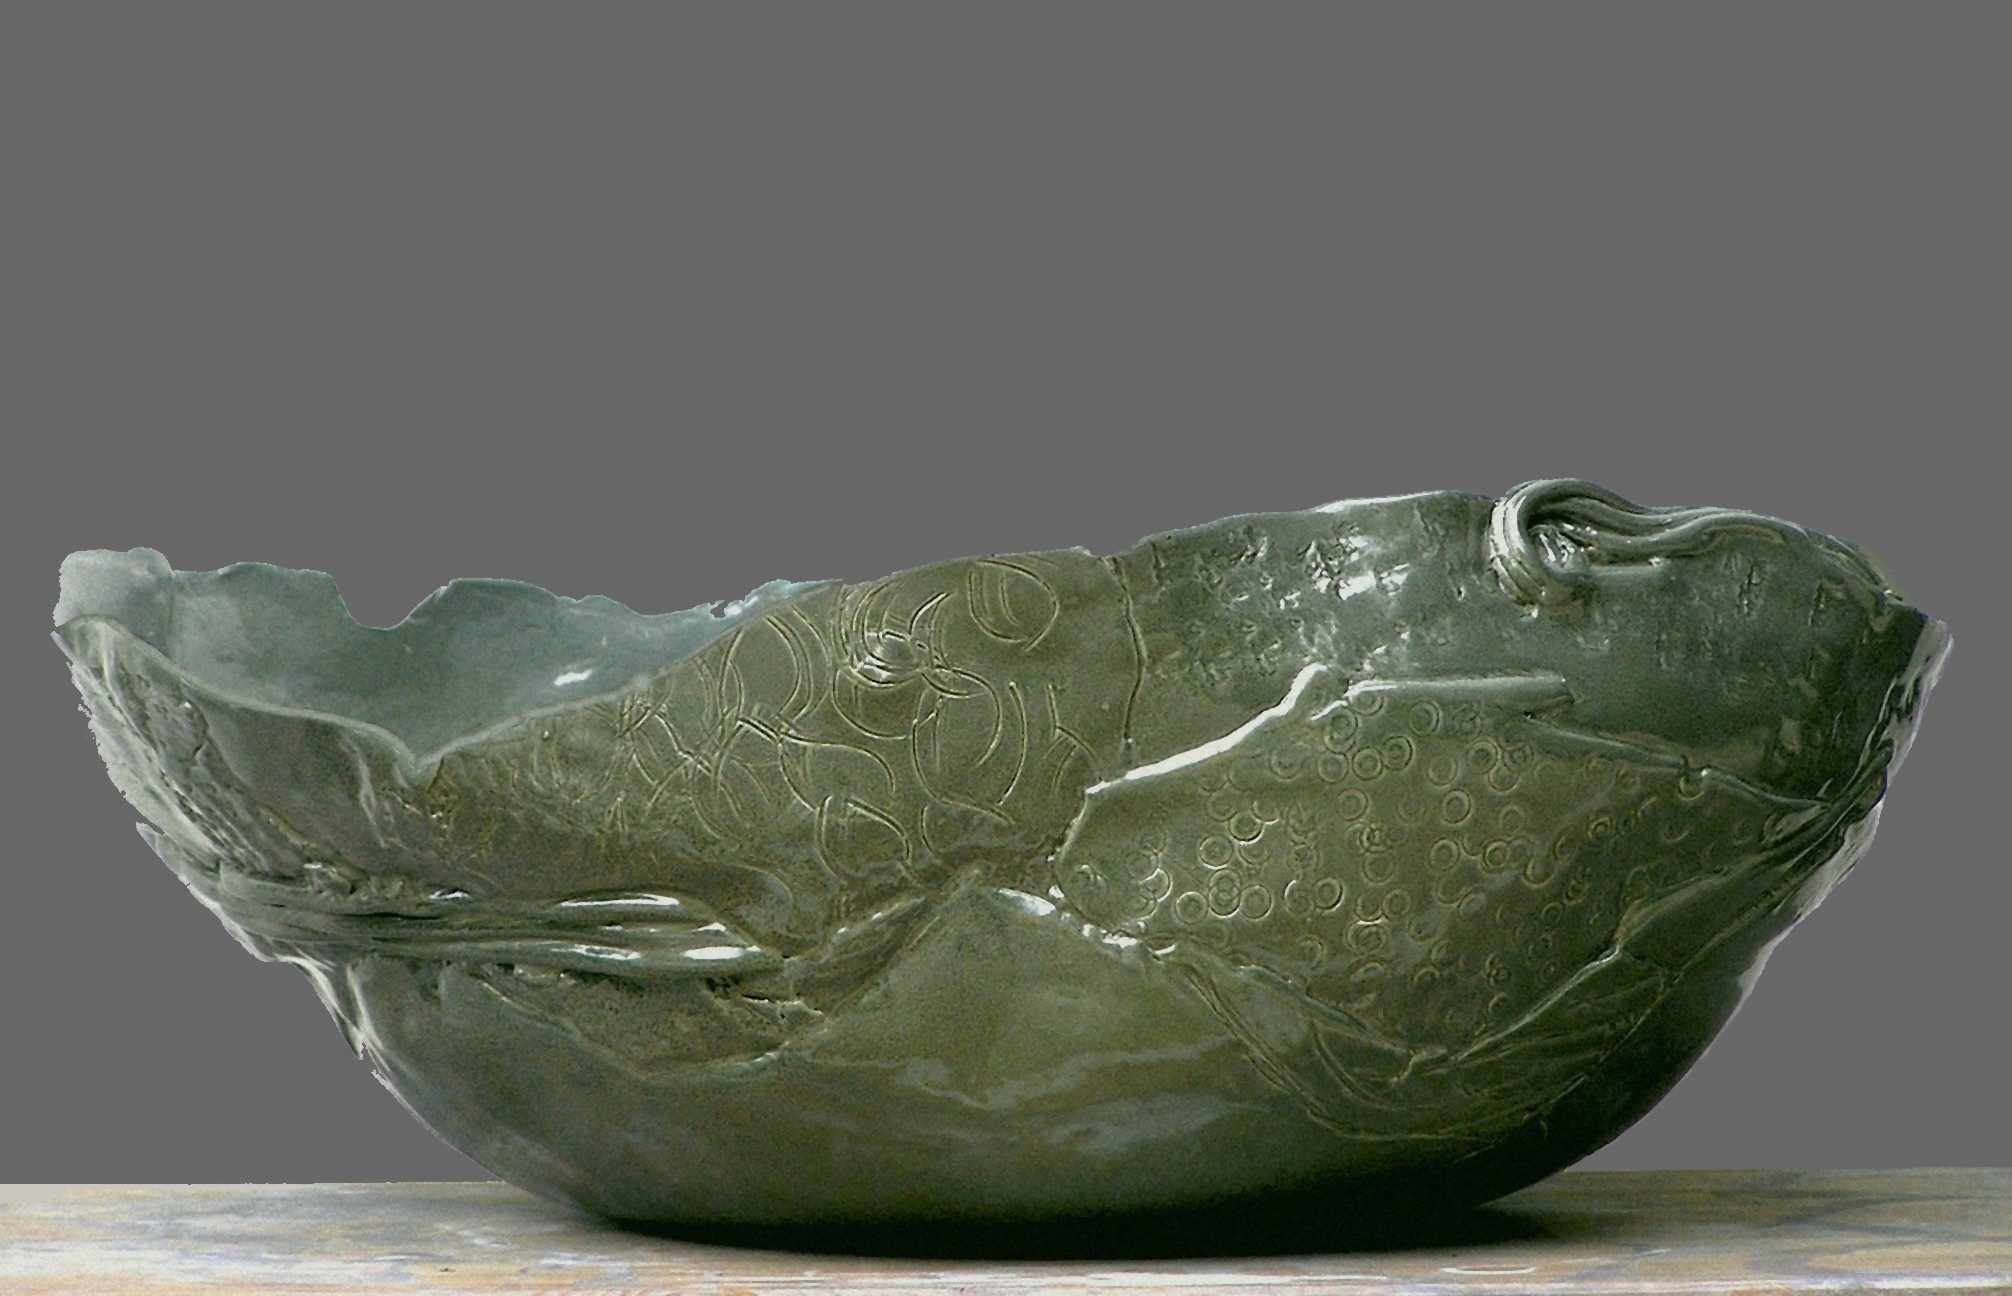 Ciotola in ceramica verde